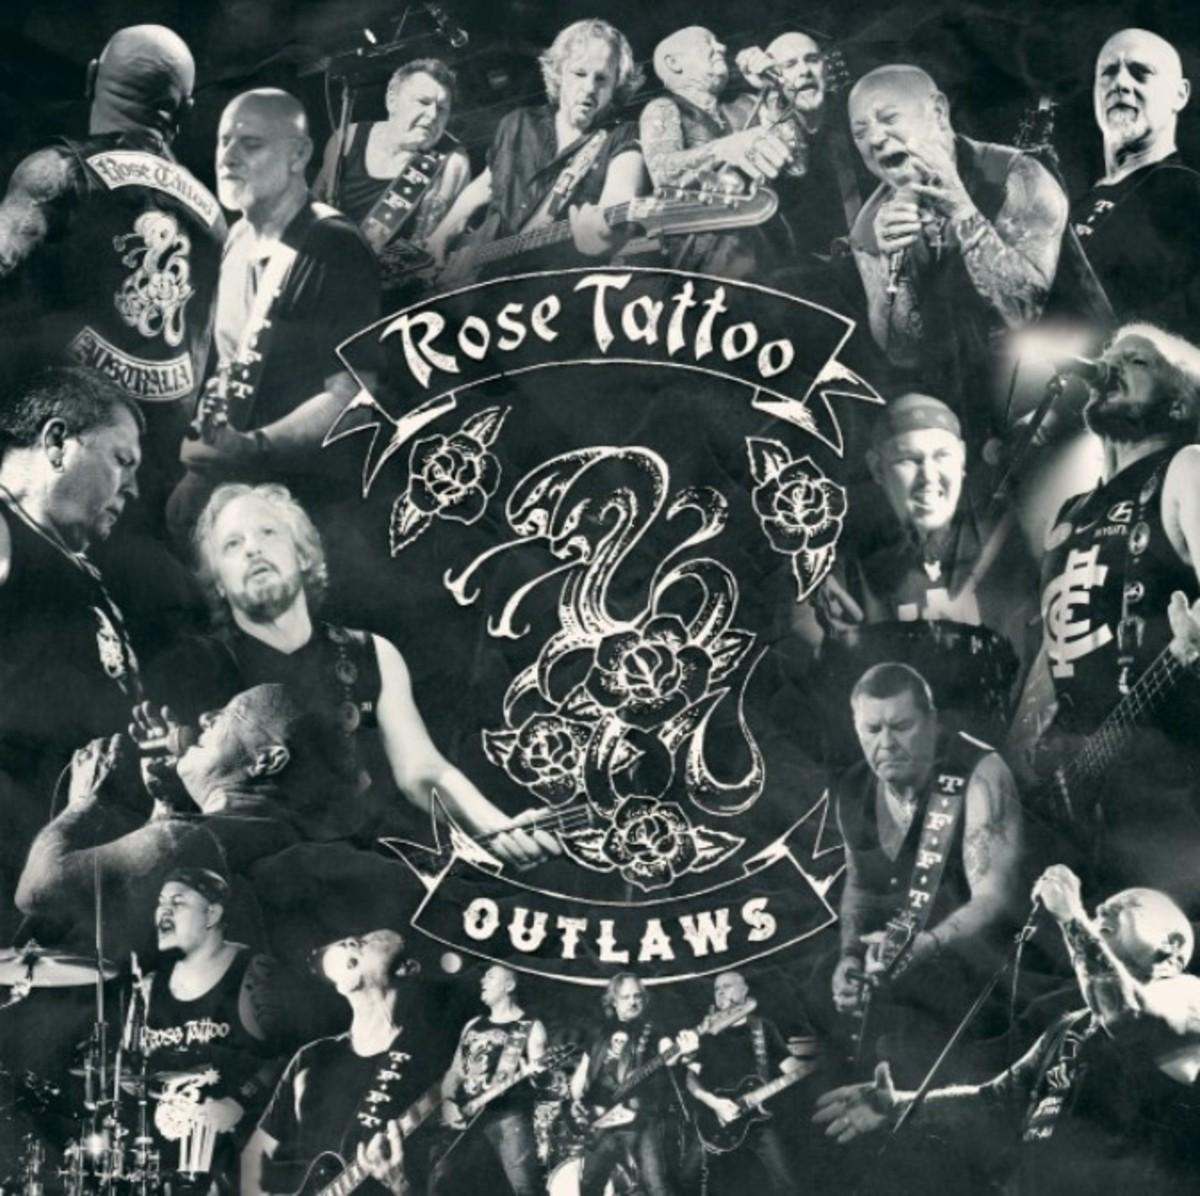 Rose Tattoo Outlaws album   cover